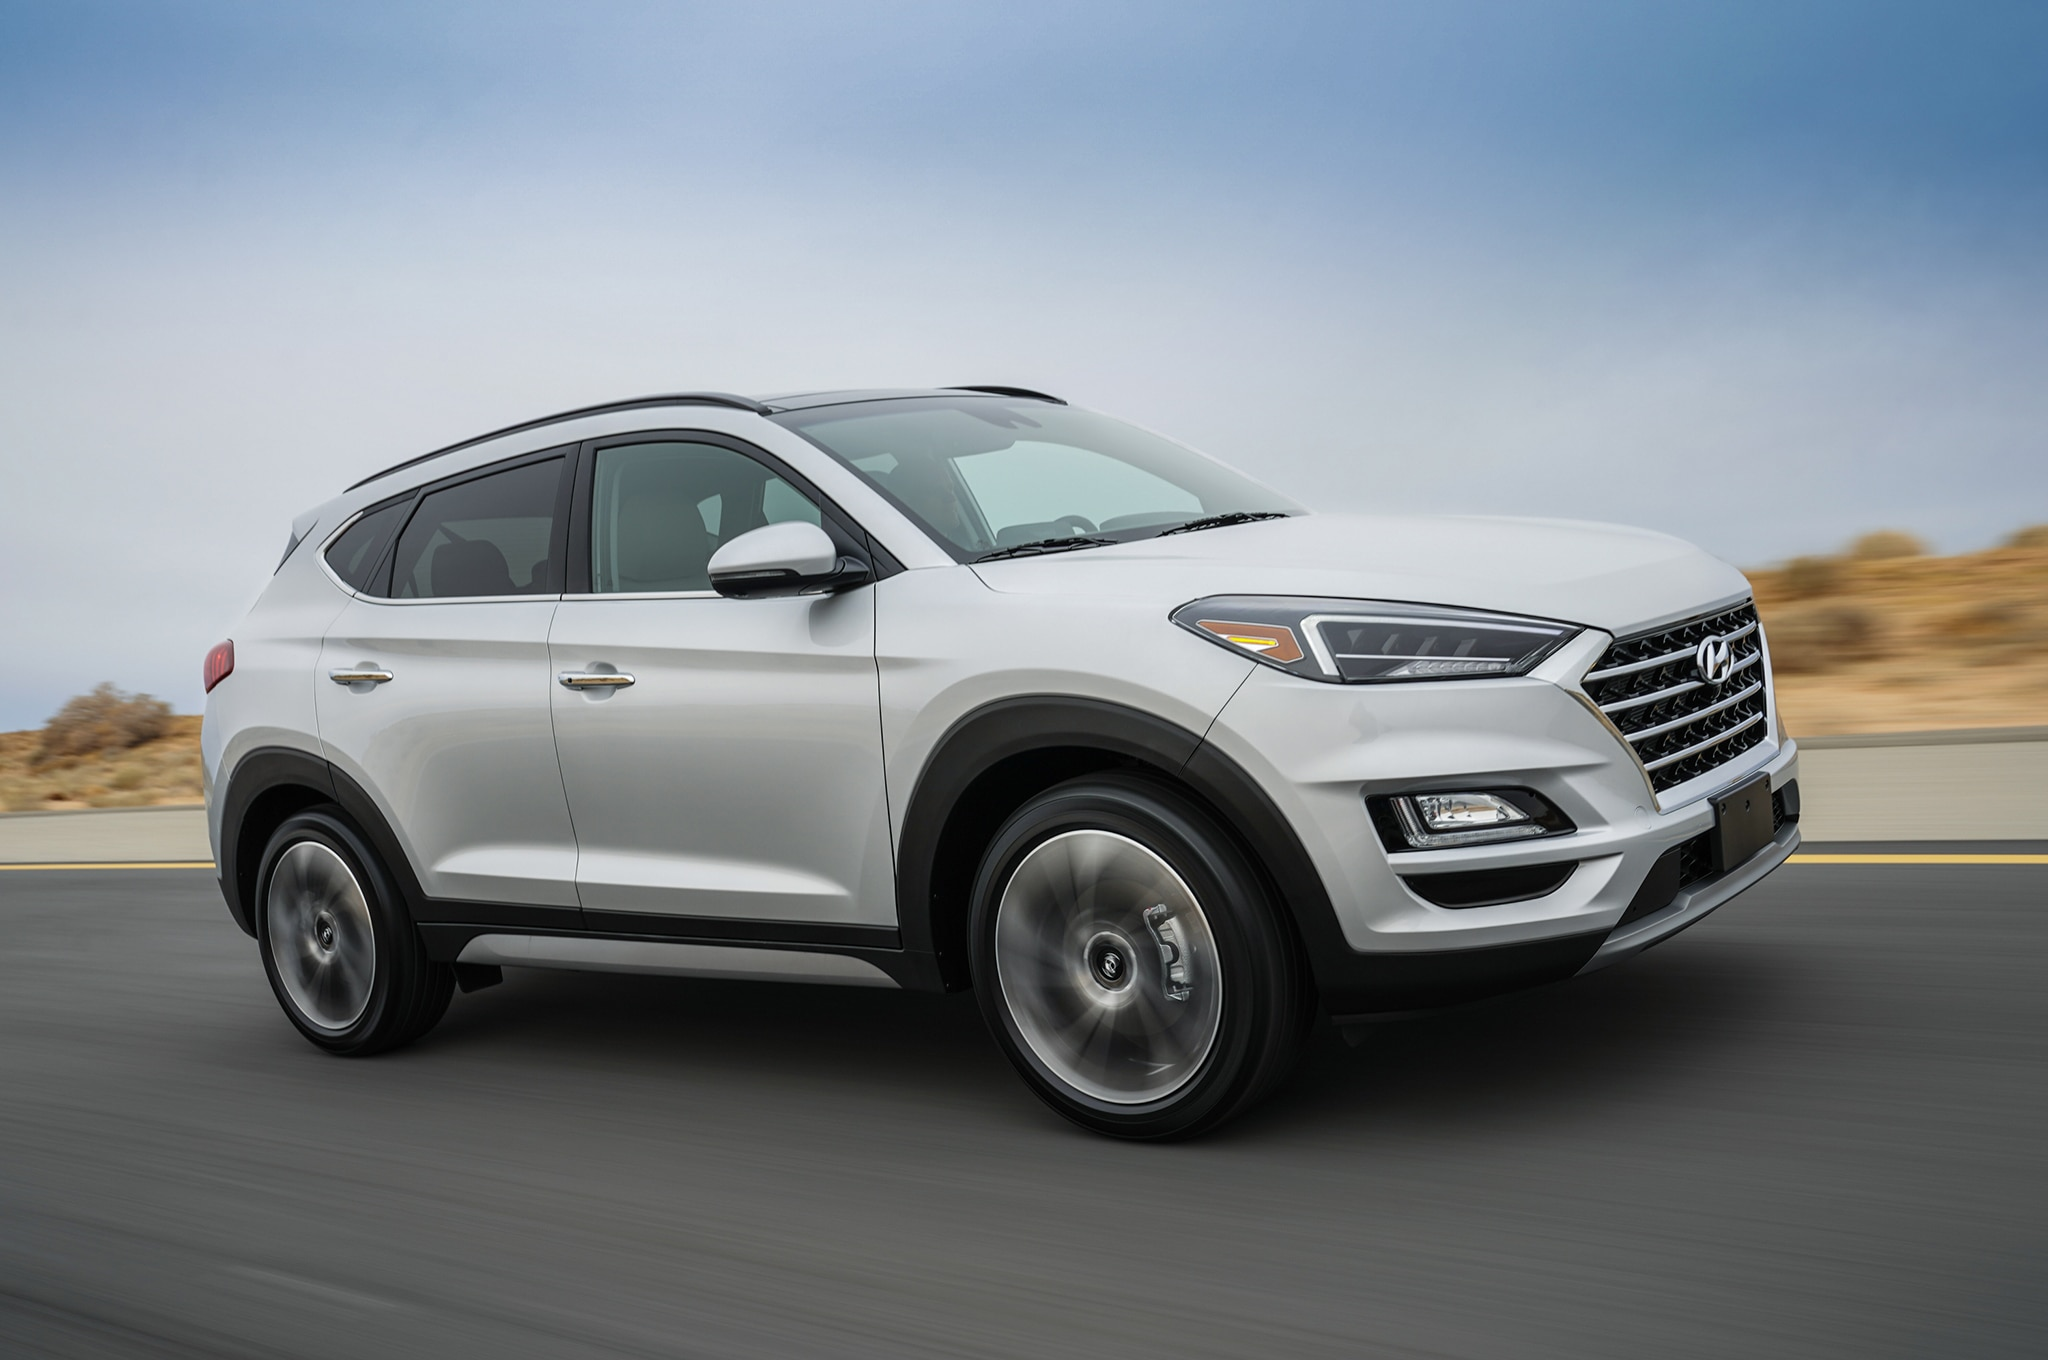 2019 Hyundai Tucson Front Three Quarter In Motion 17